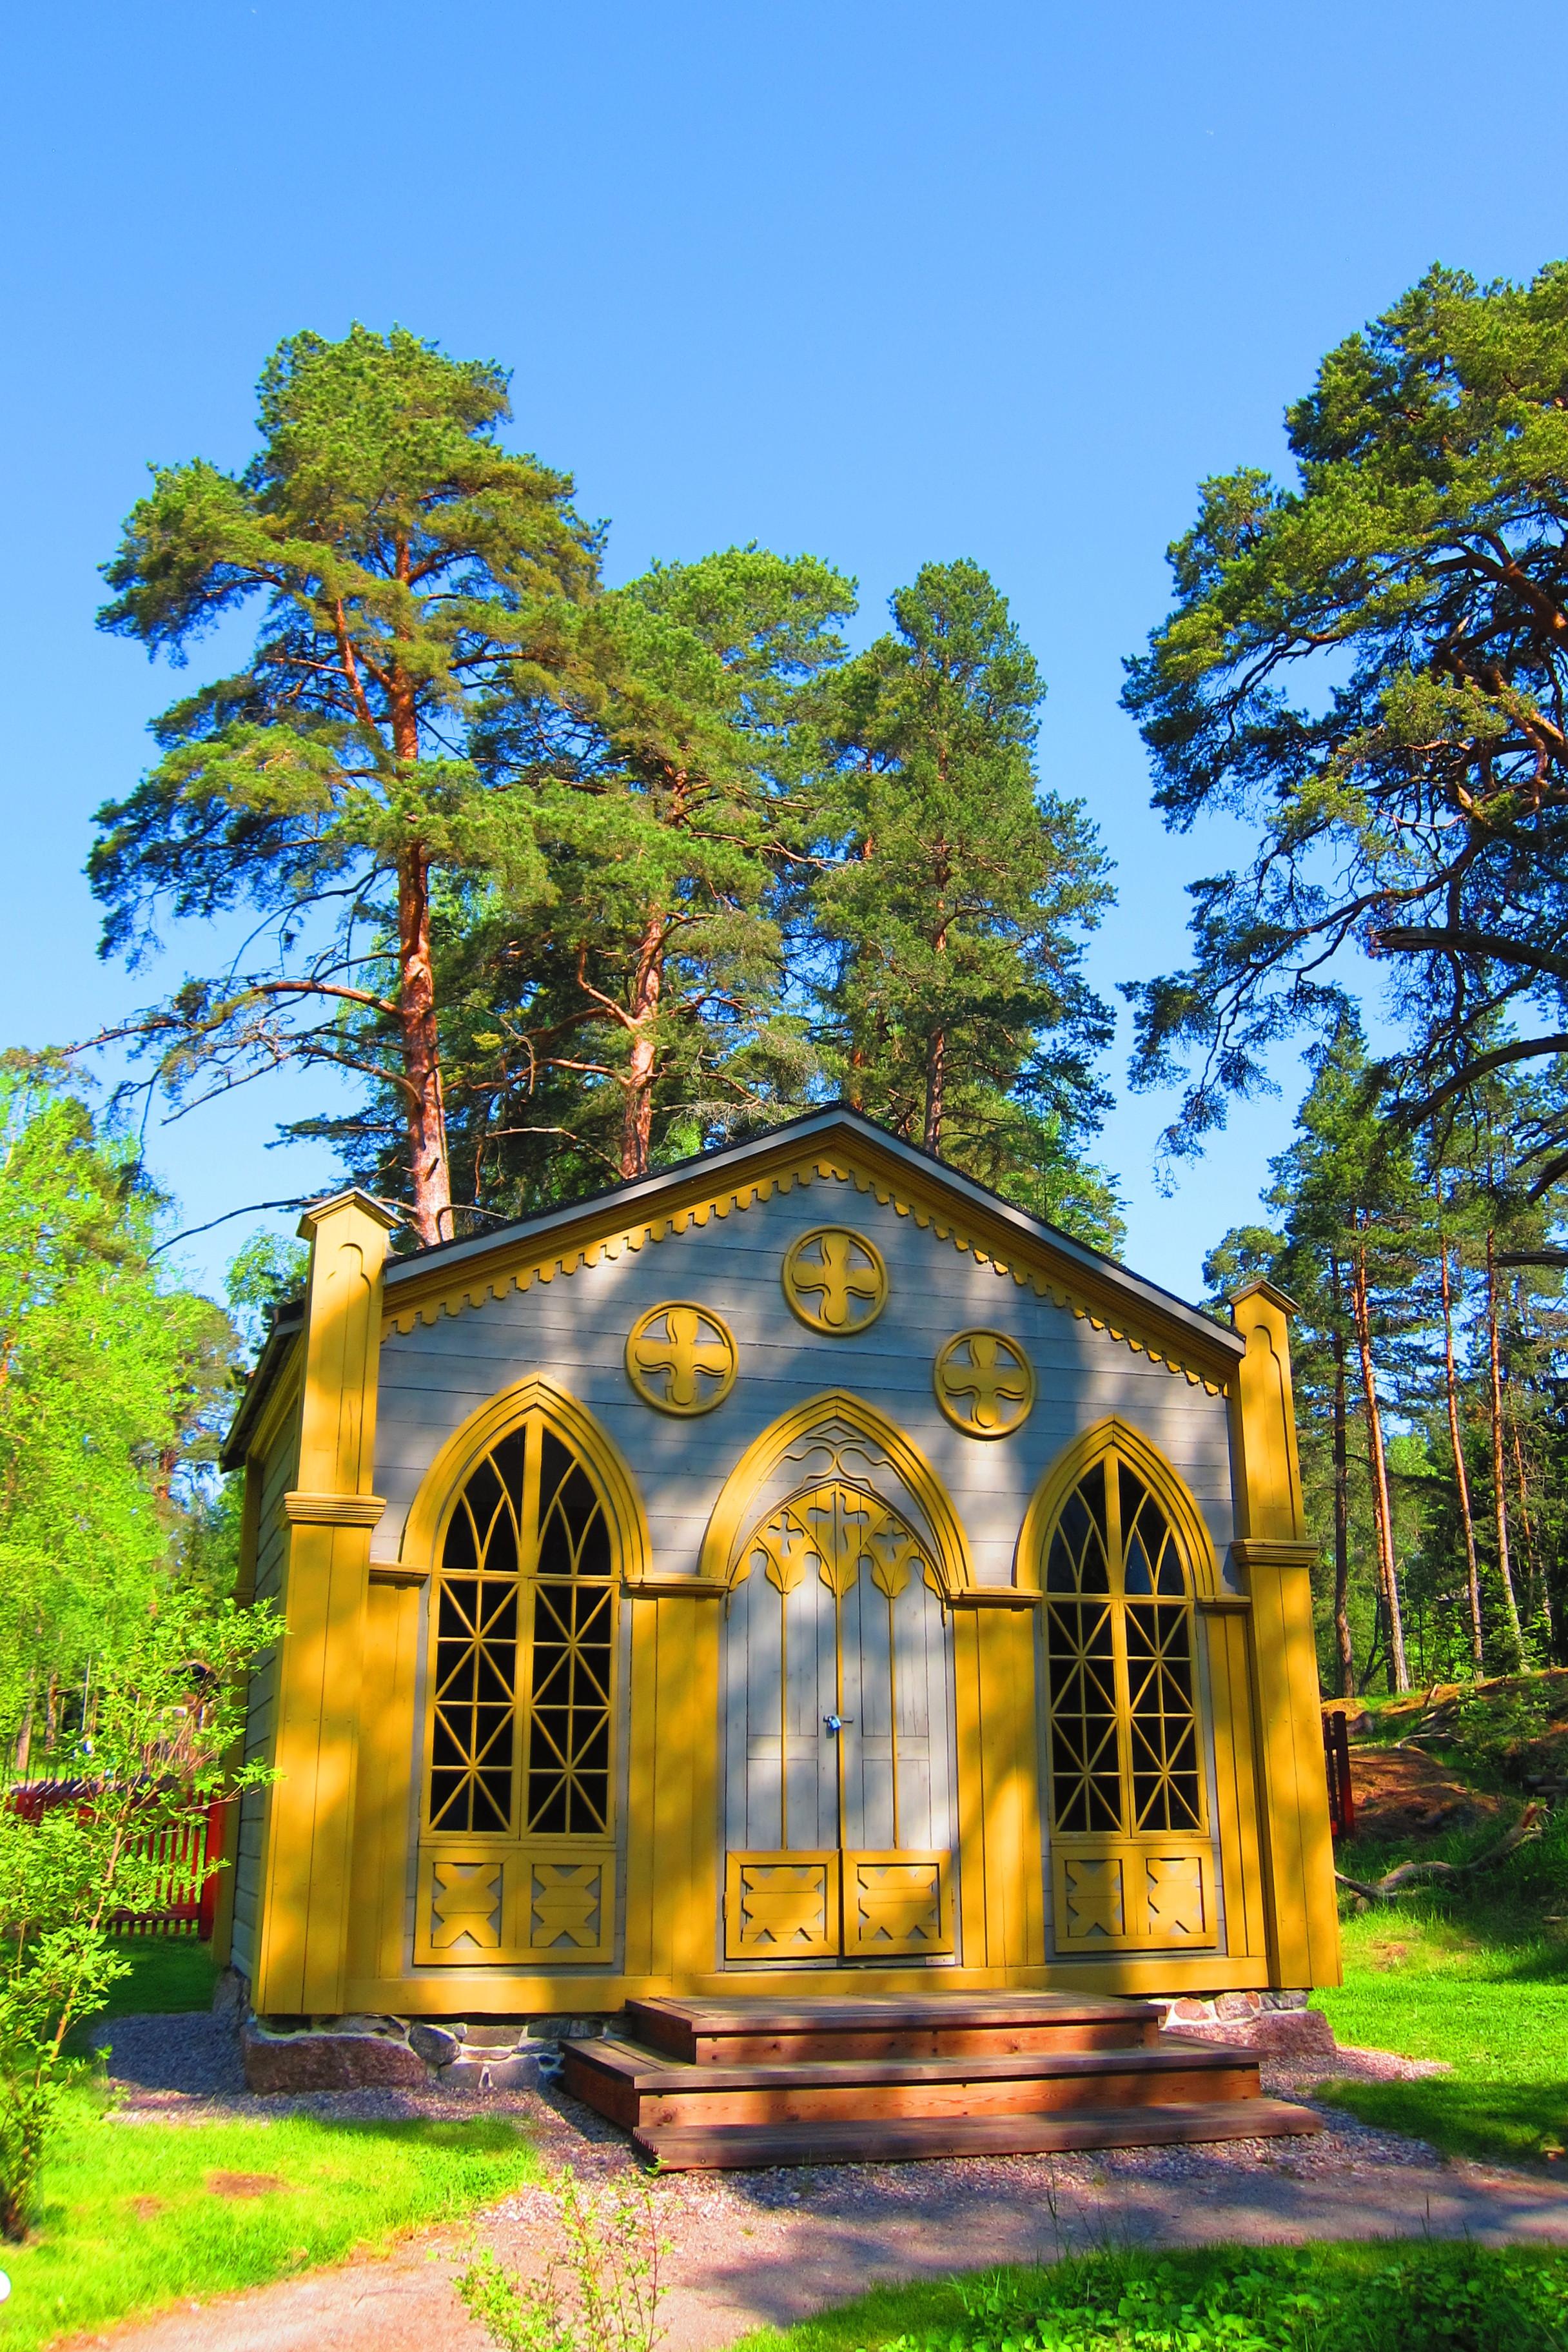 Seurasaari open air museum Helsinki, 5/22/19